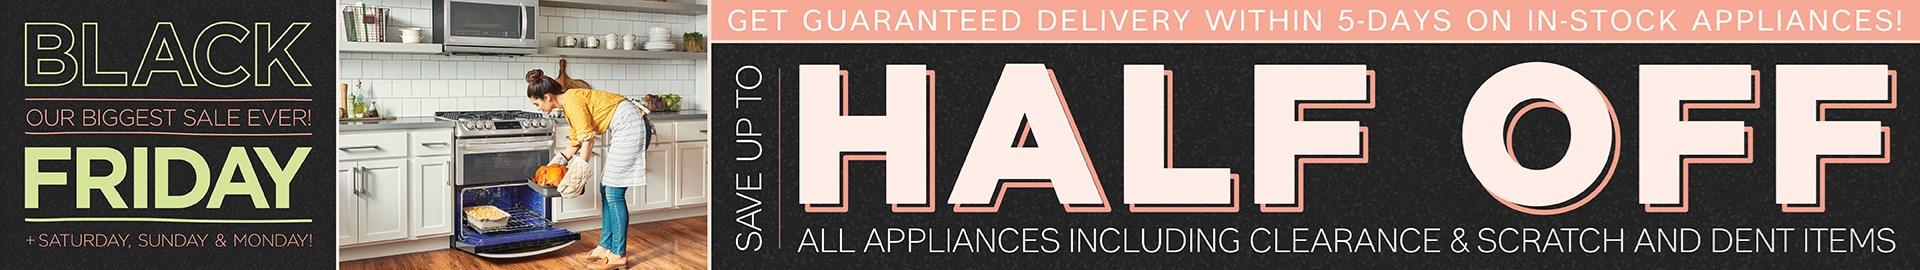 Furnitur & ApplianceMart Black Friday Sale